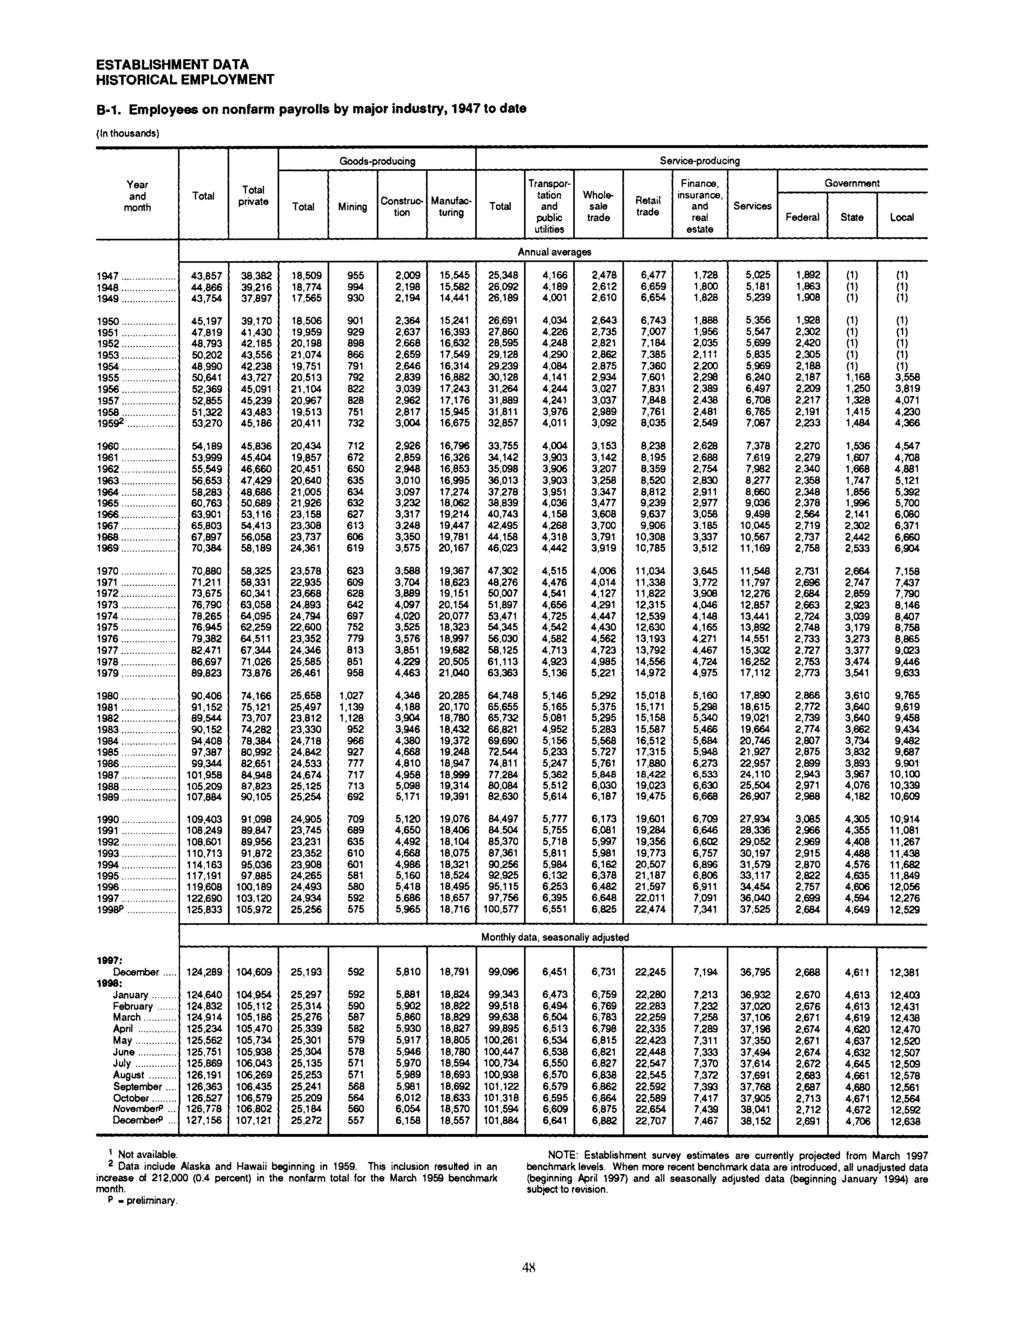 "Bureau"" Df Lalw^l^t Stic.s,pnuary1999., ' "" Aih Iual In Aiken County Public School District Calendar 2021 2020"